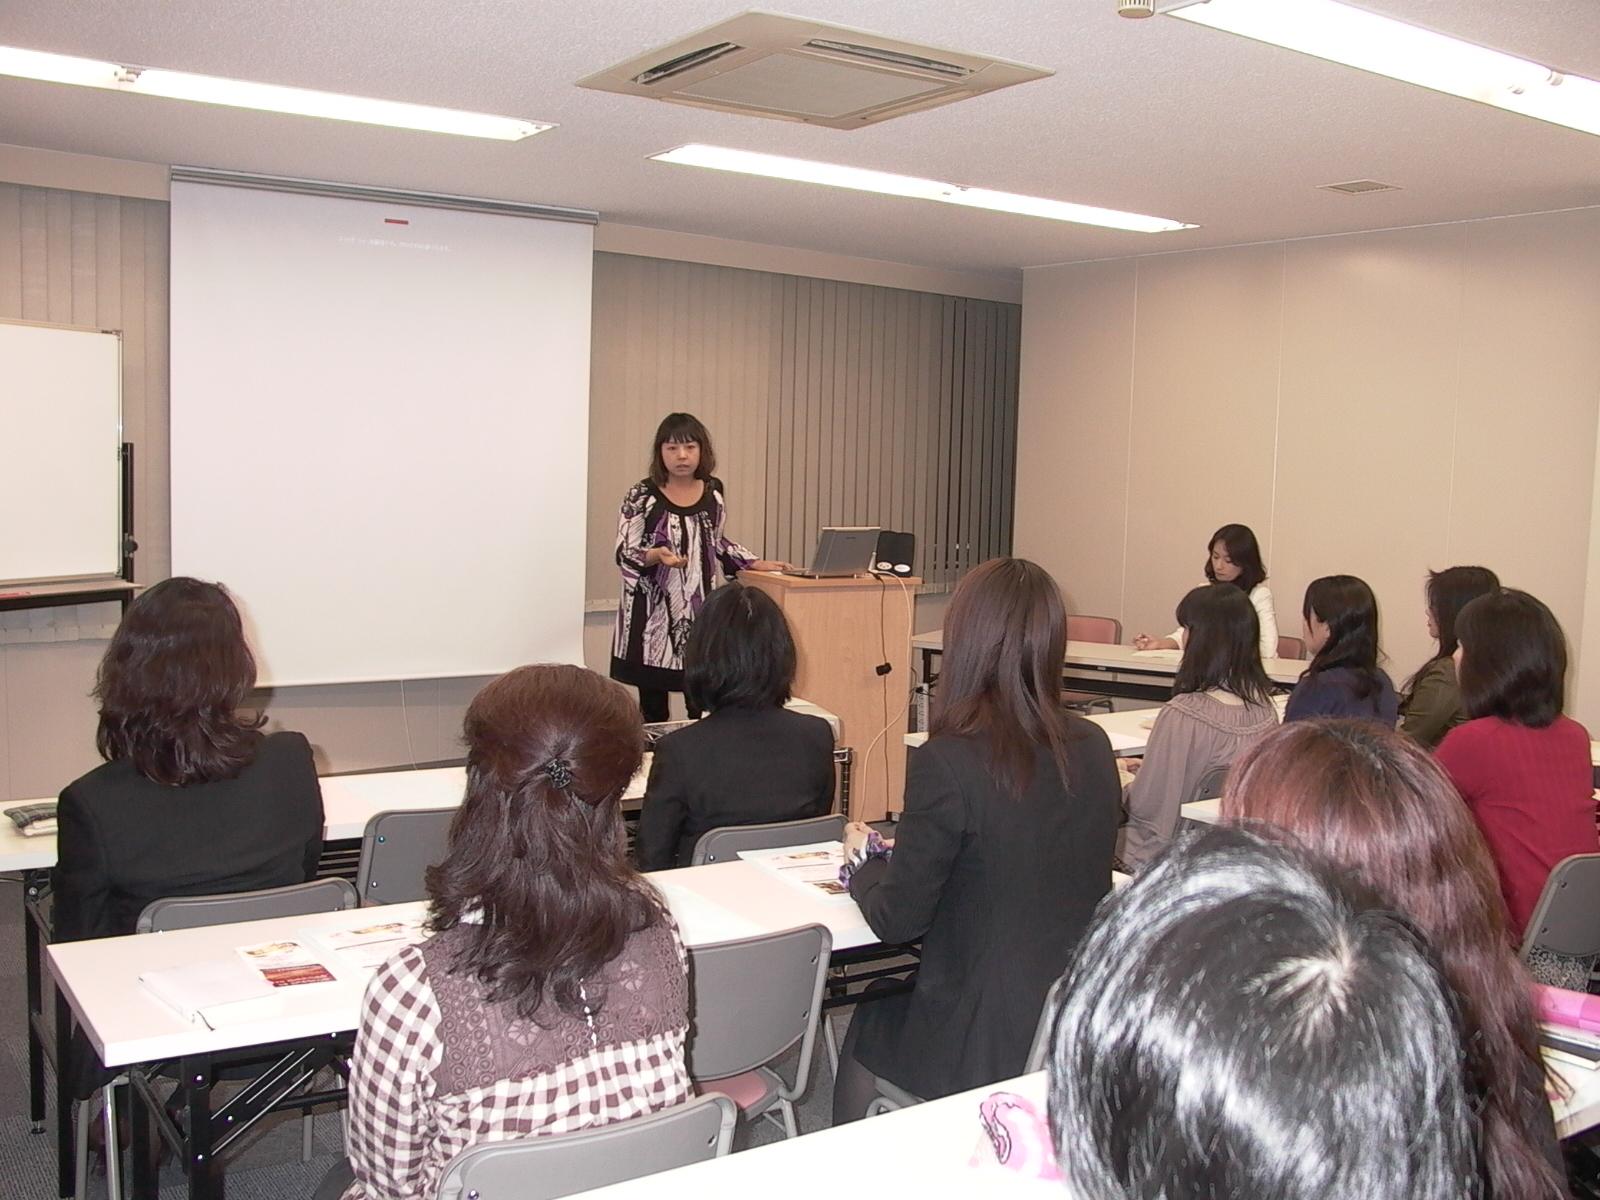 7photo1.jpg